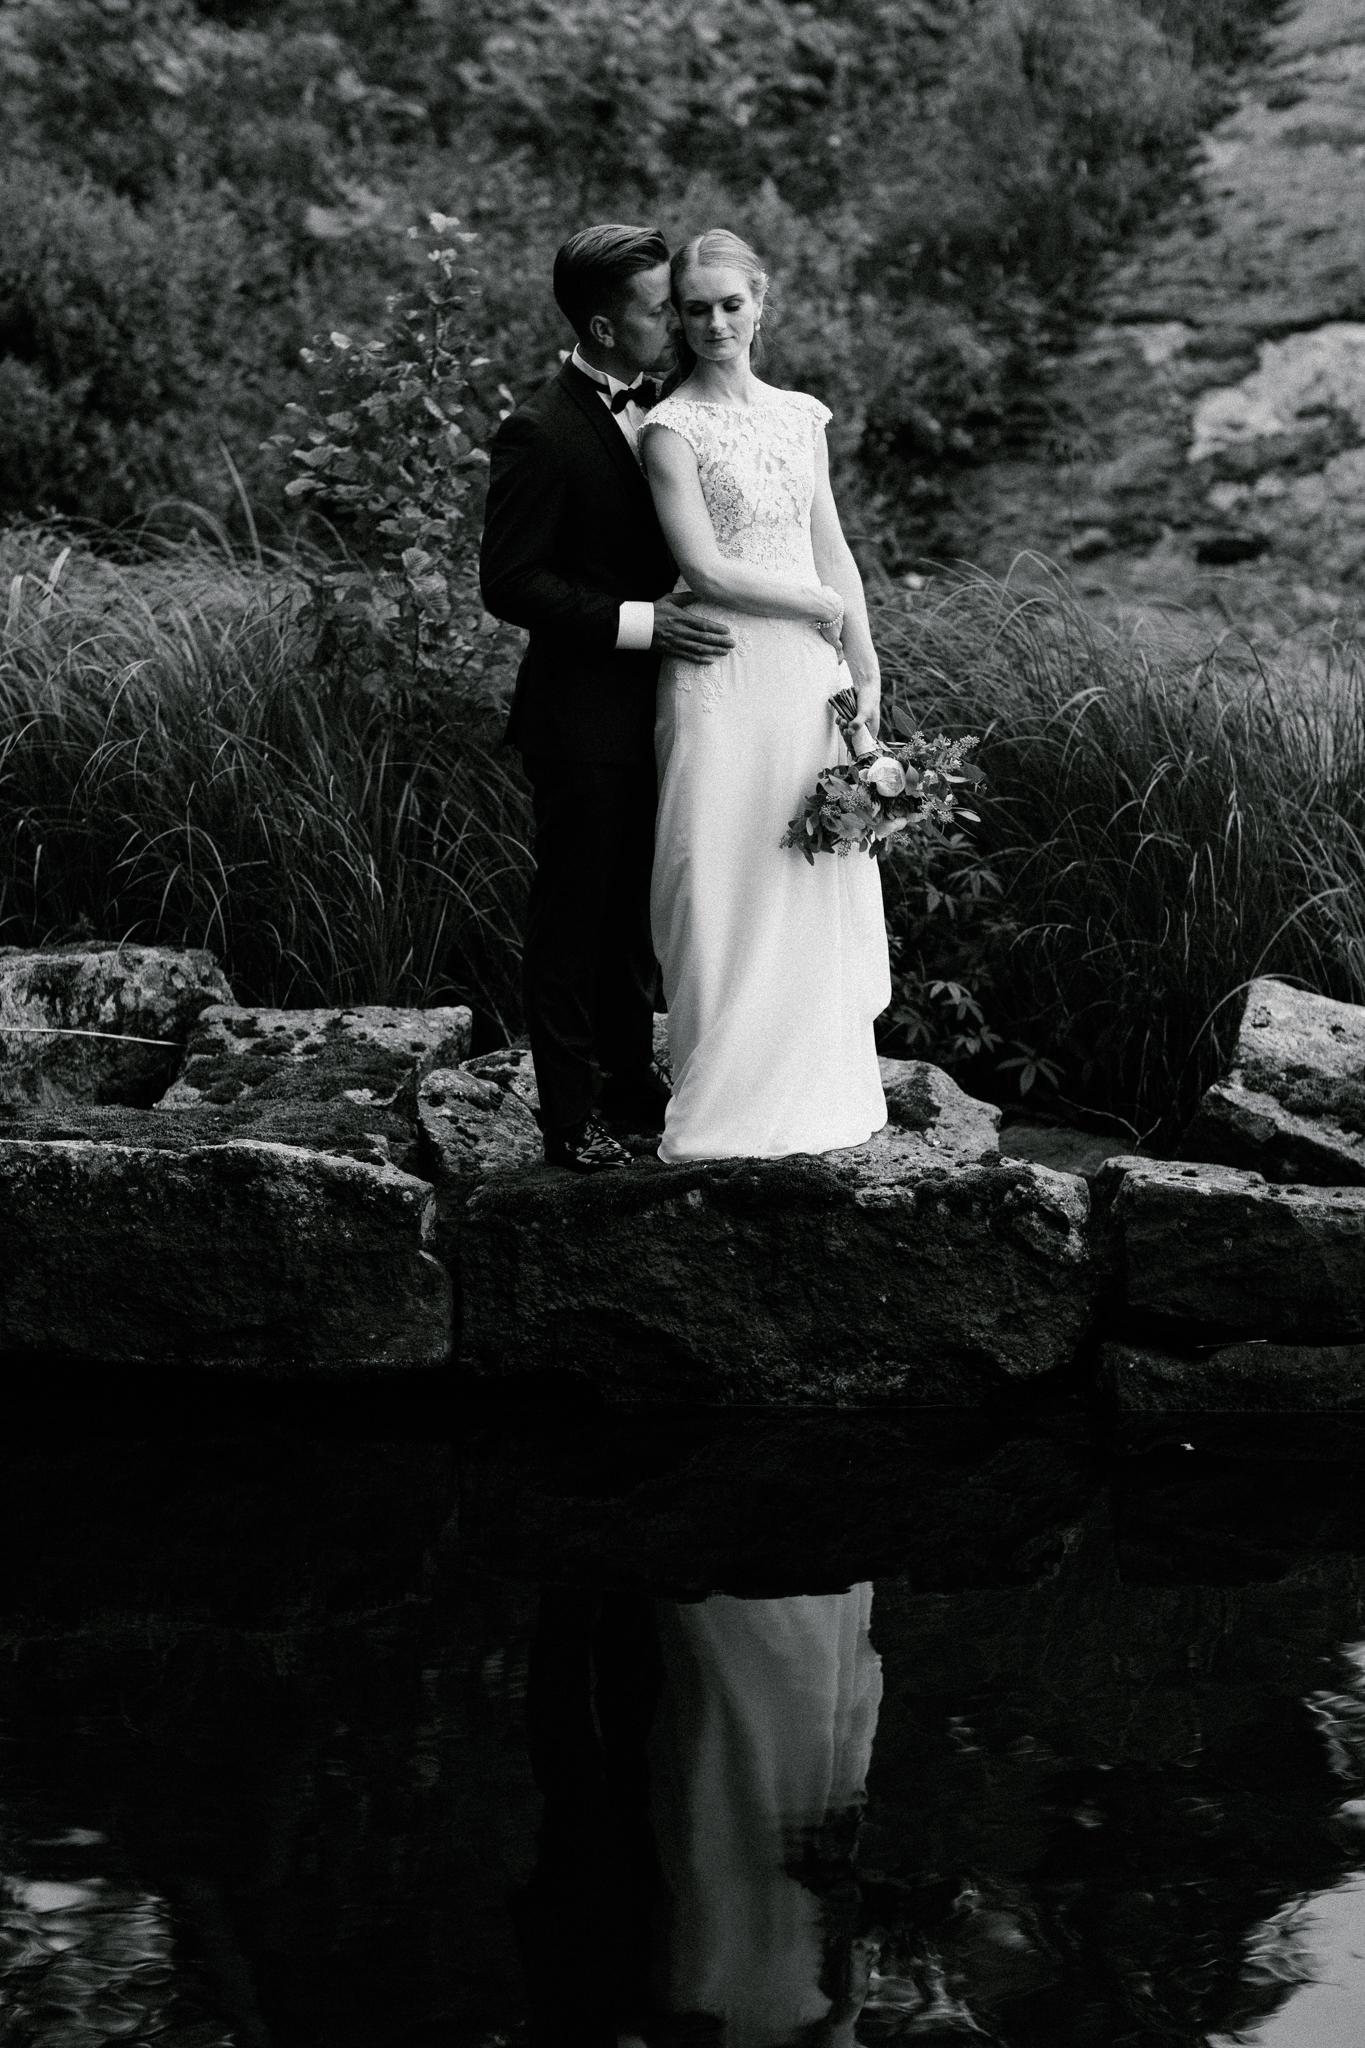 Jessica + Patrick | Fagervik | by Patrick Karkkolainen Wedding Photography-15.jpg